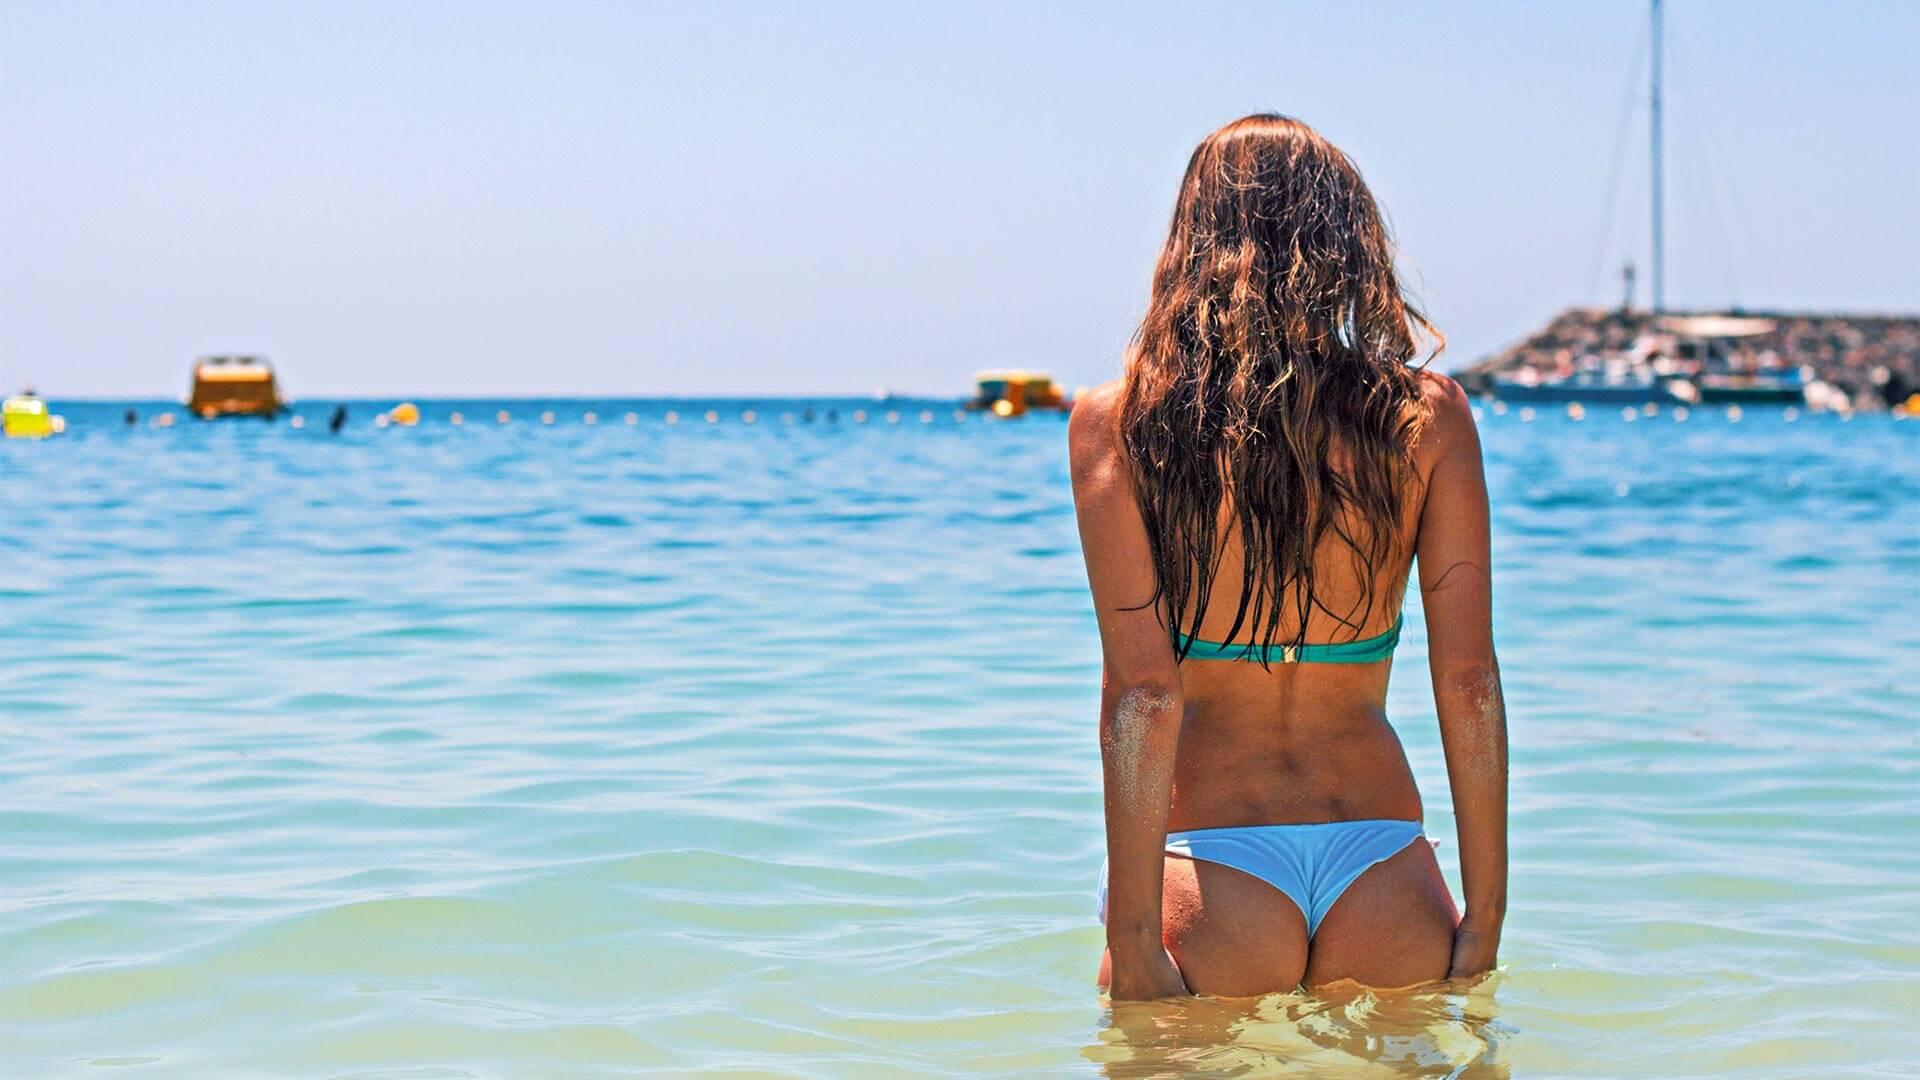 Reef Safe Sunscreen While Scuba Diving